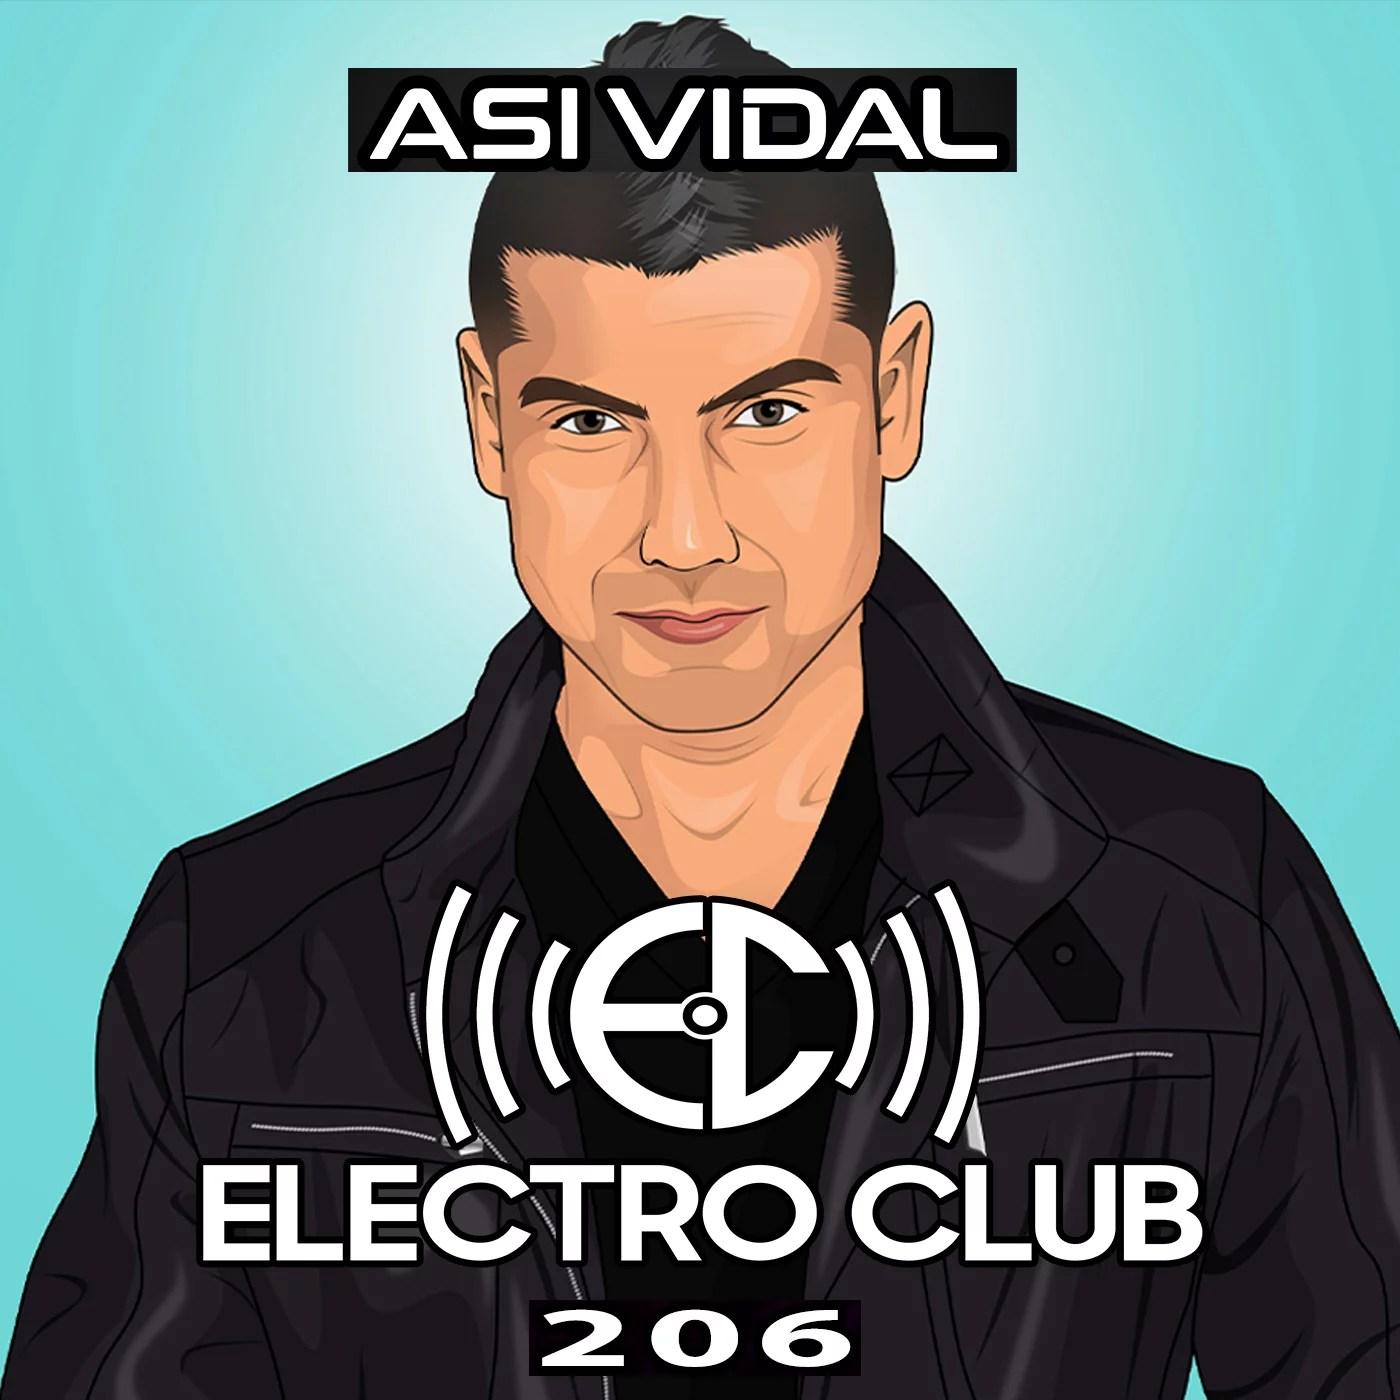 electro club 206